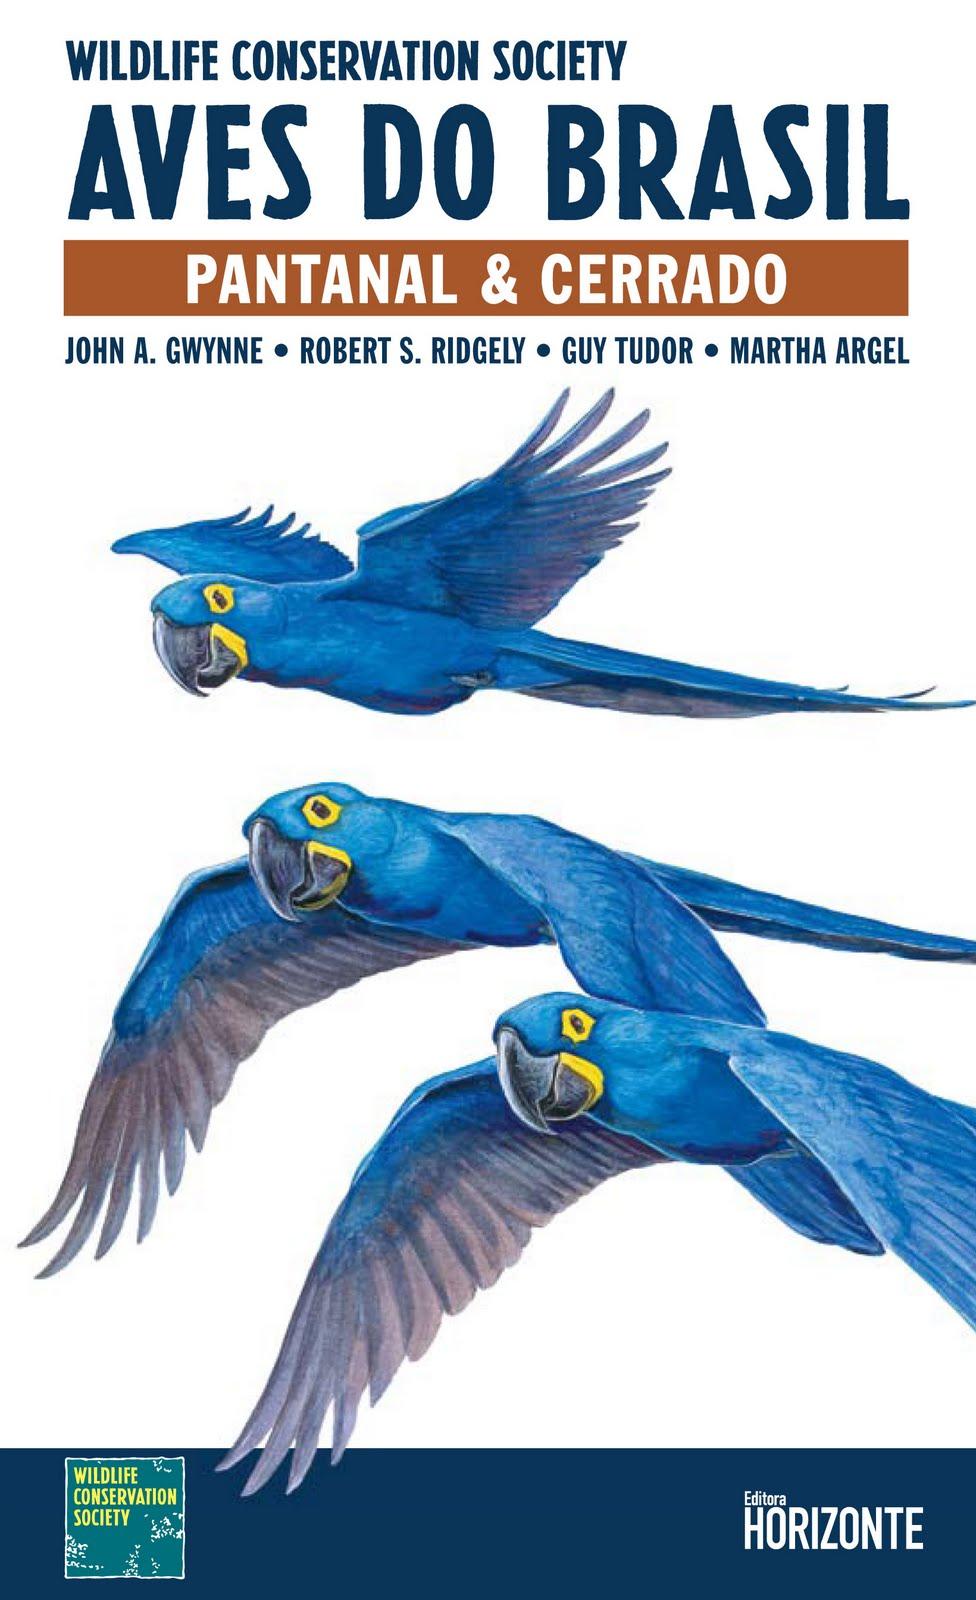 Autores - John A. Gwinne, Robert S. Ridgely, Guy Tudor e Martha Argel